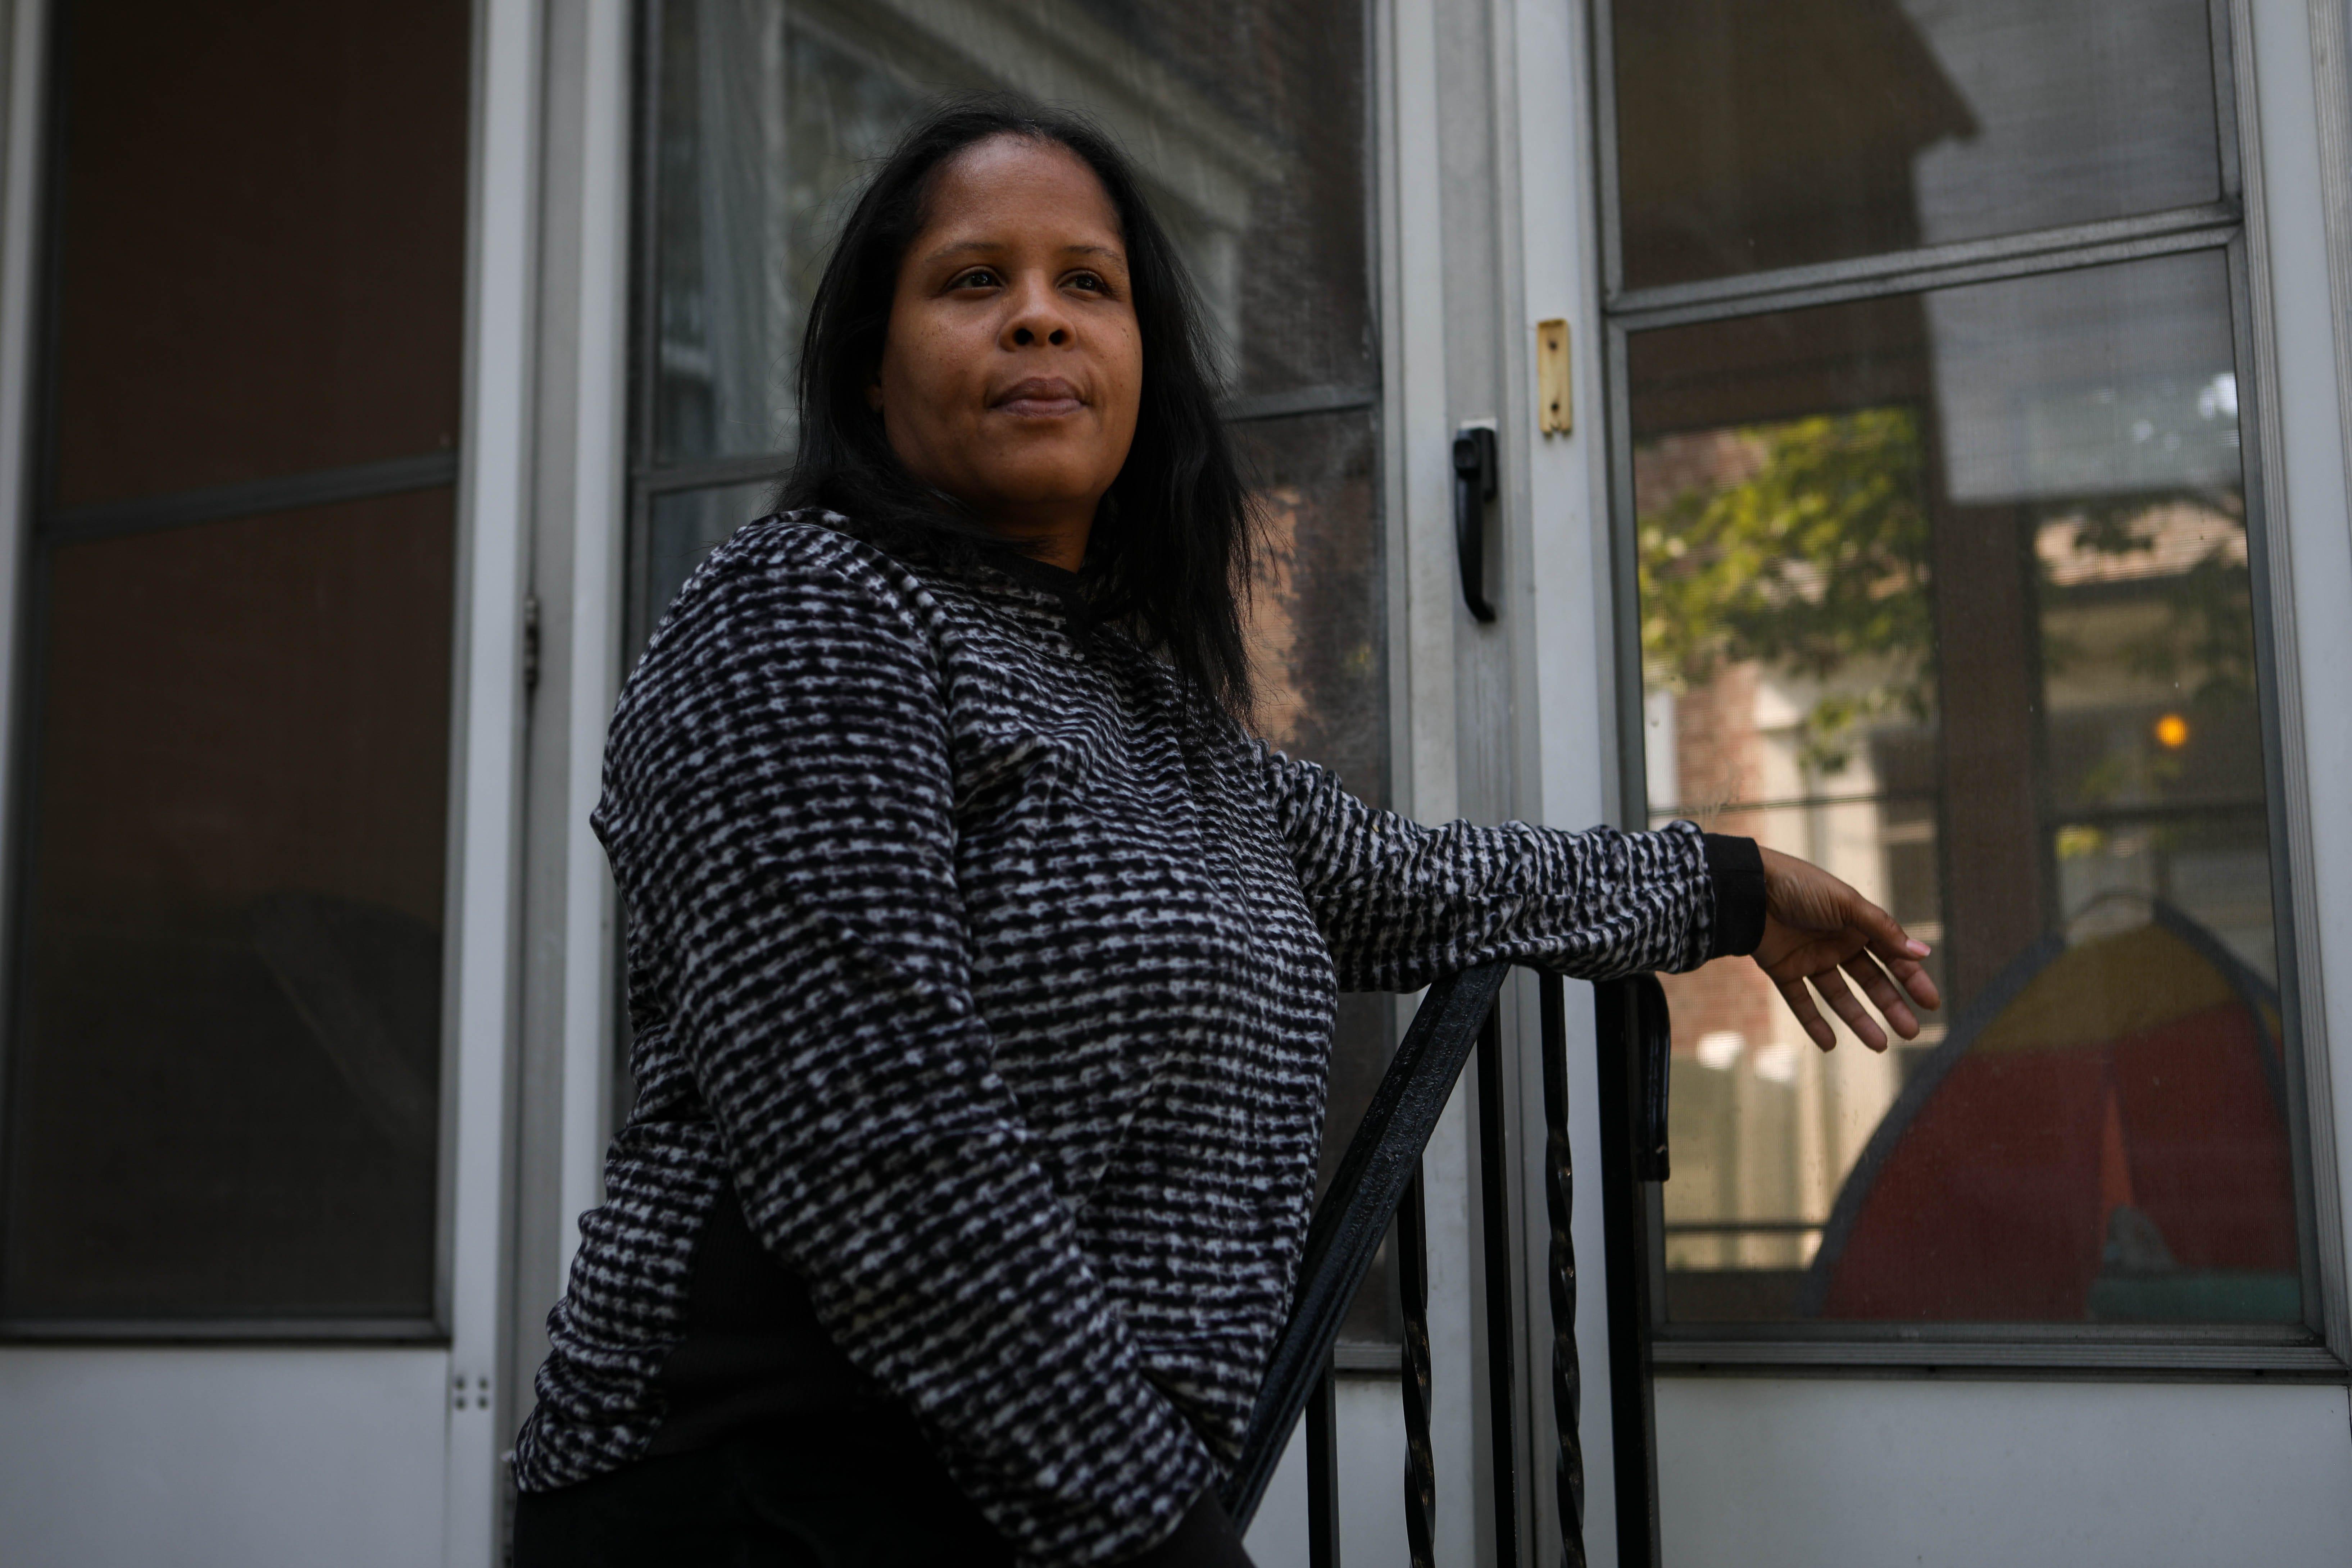 JondaBrown, 45, caregiver